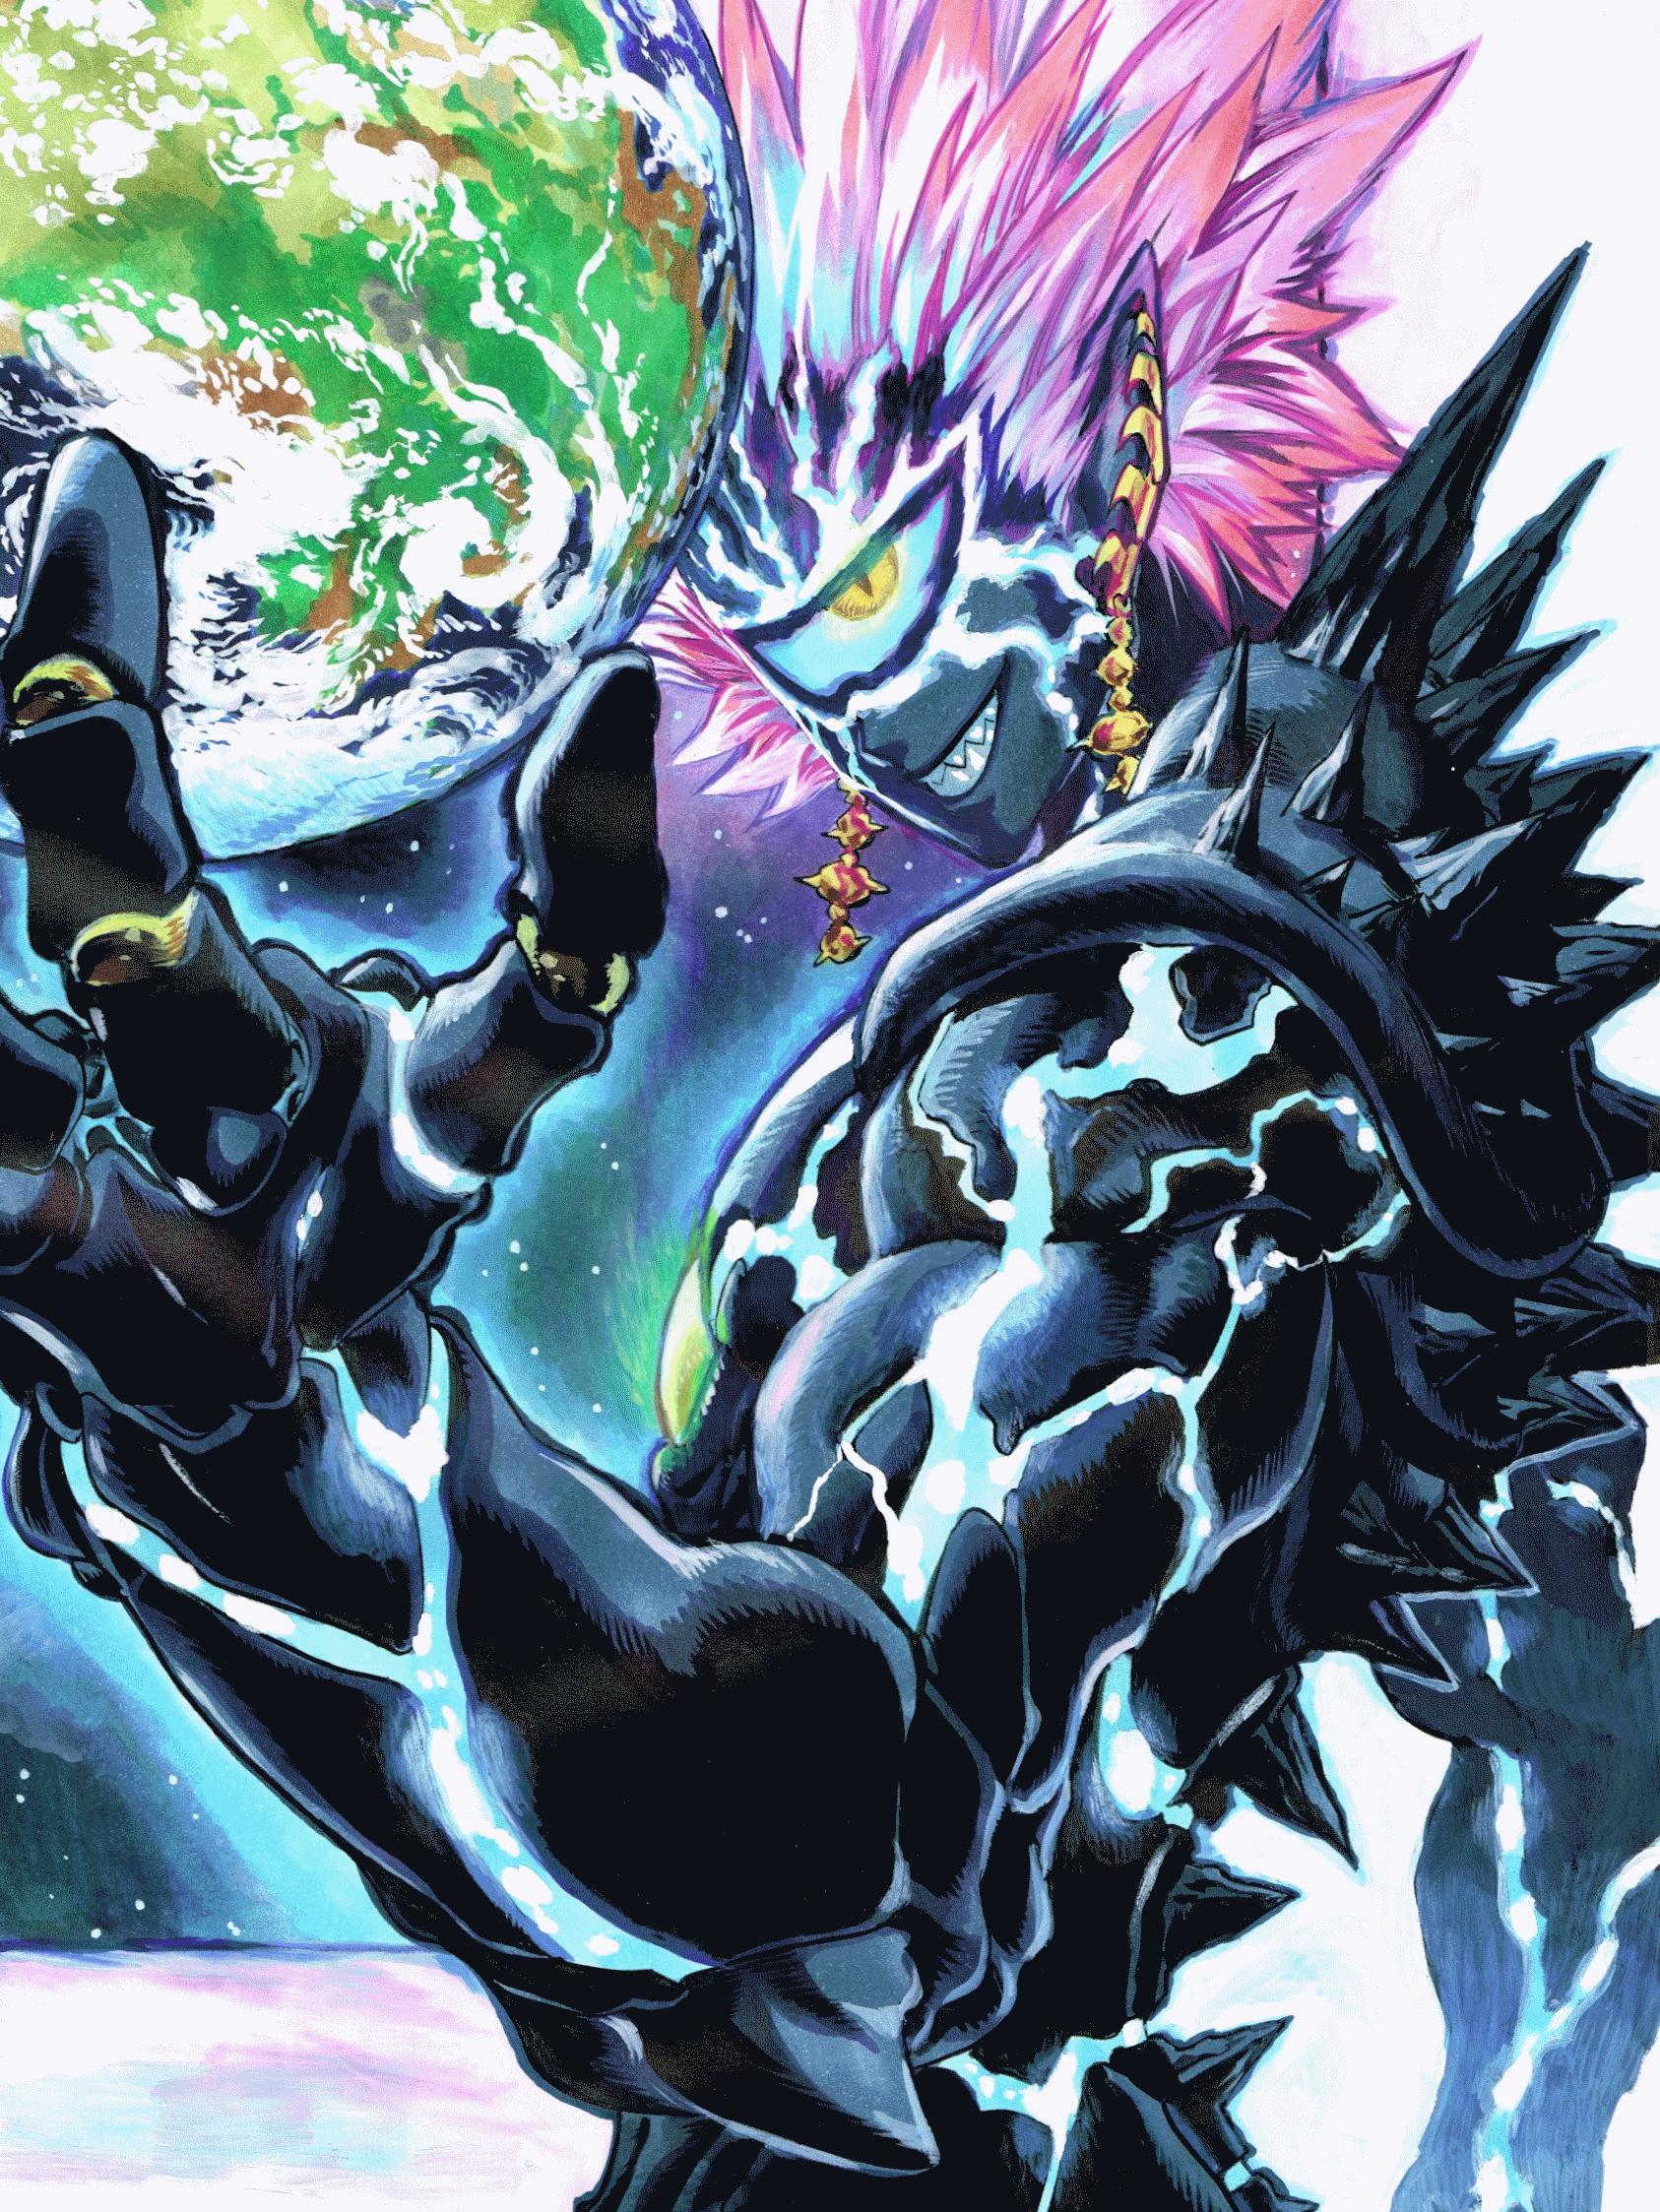 One Punch Man Saitama Vs Boros - Boros | One-Punch Man Wiki | Fandom